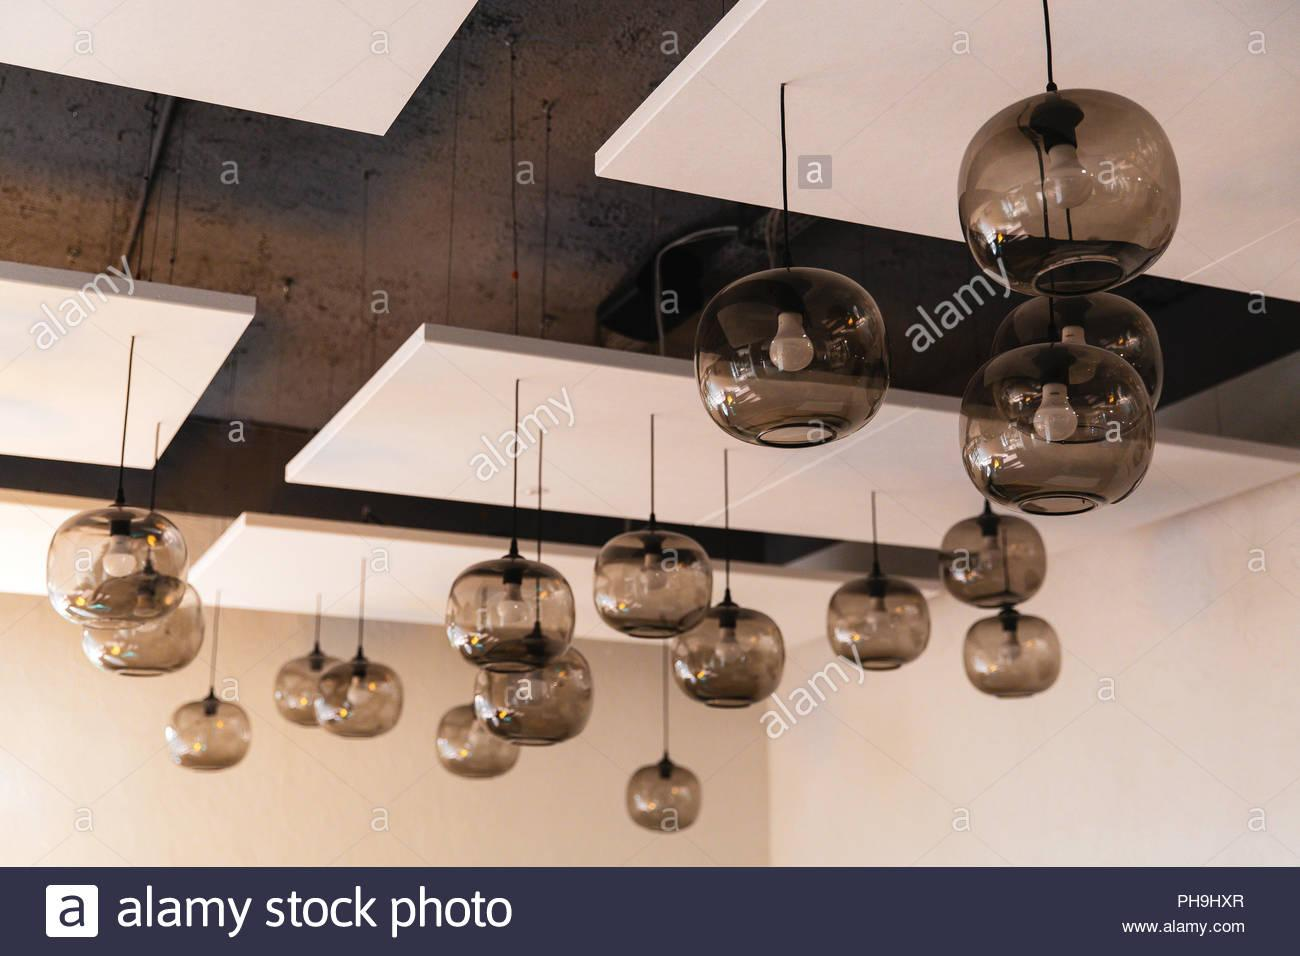 Globus Lampe Hängend